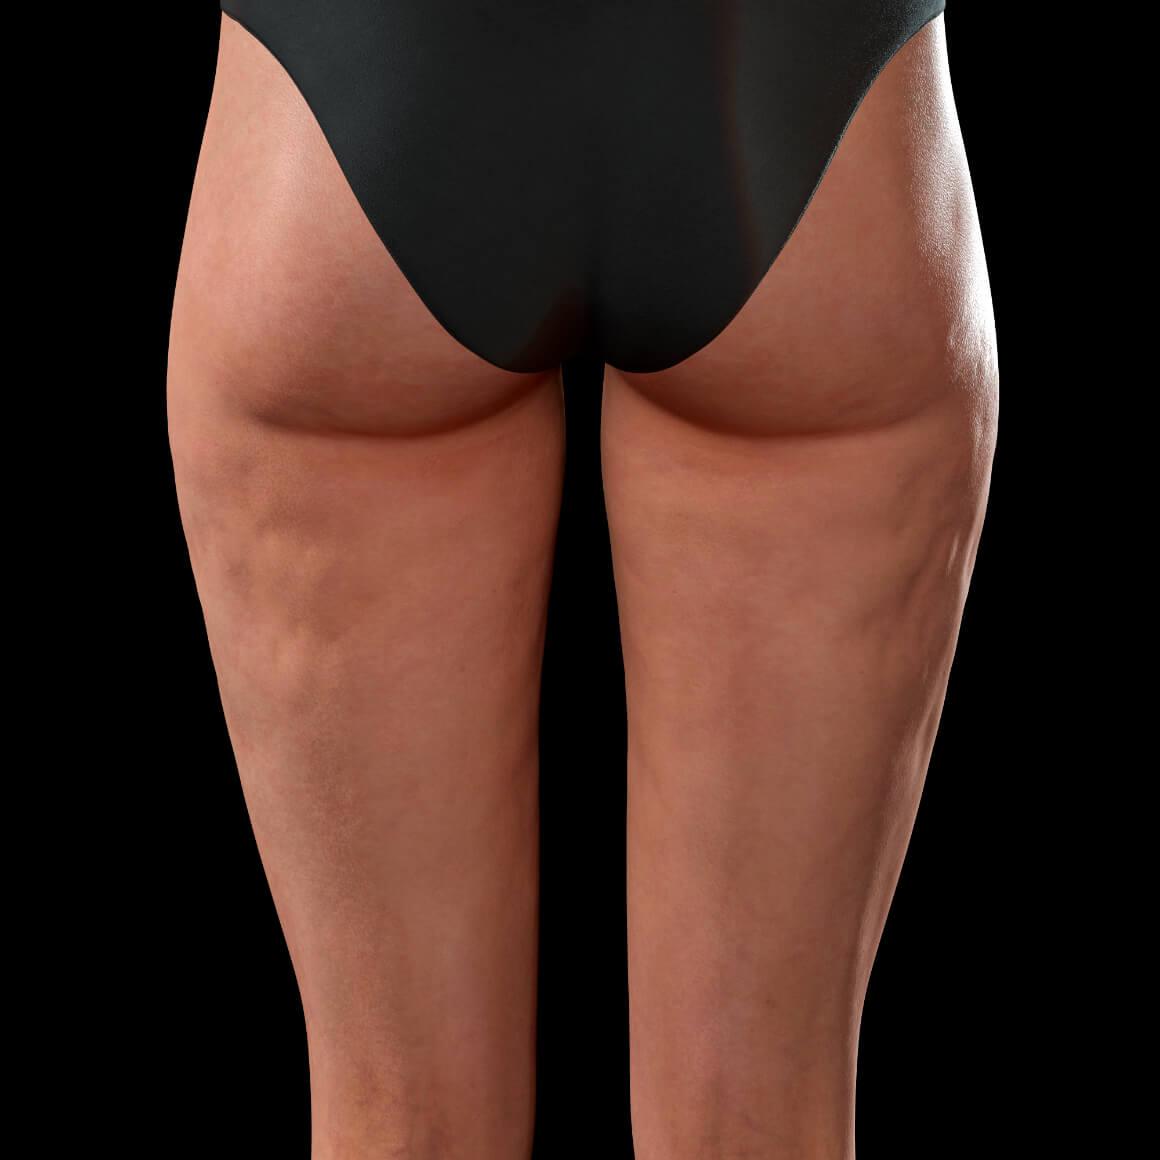 Back thighs of a Clinique Chloé female patient showing cellulite